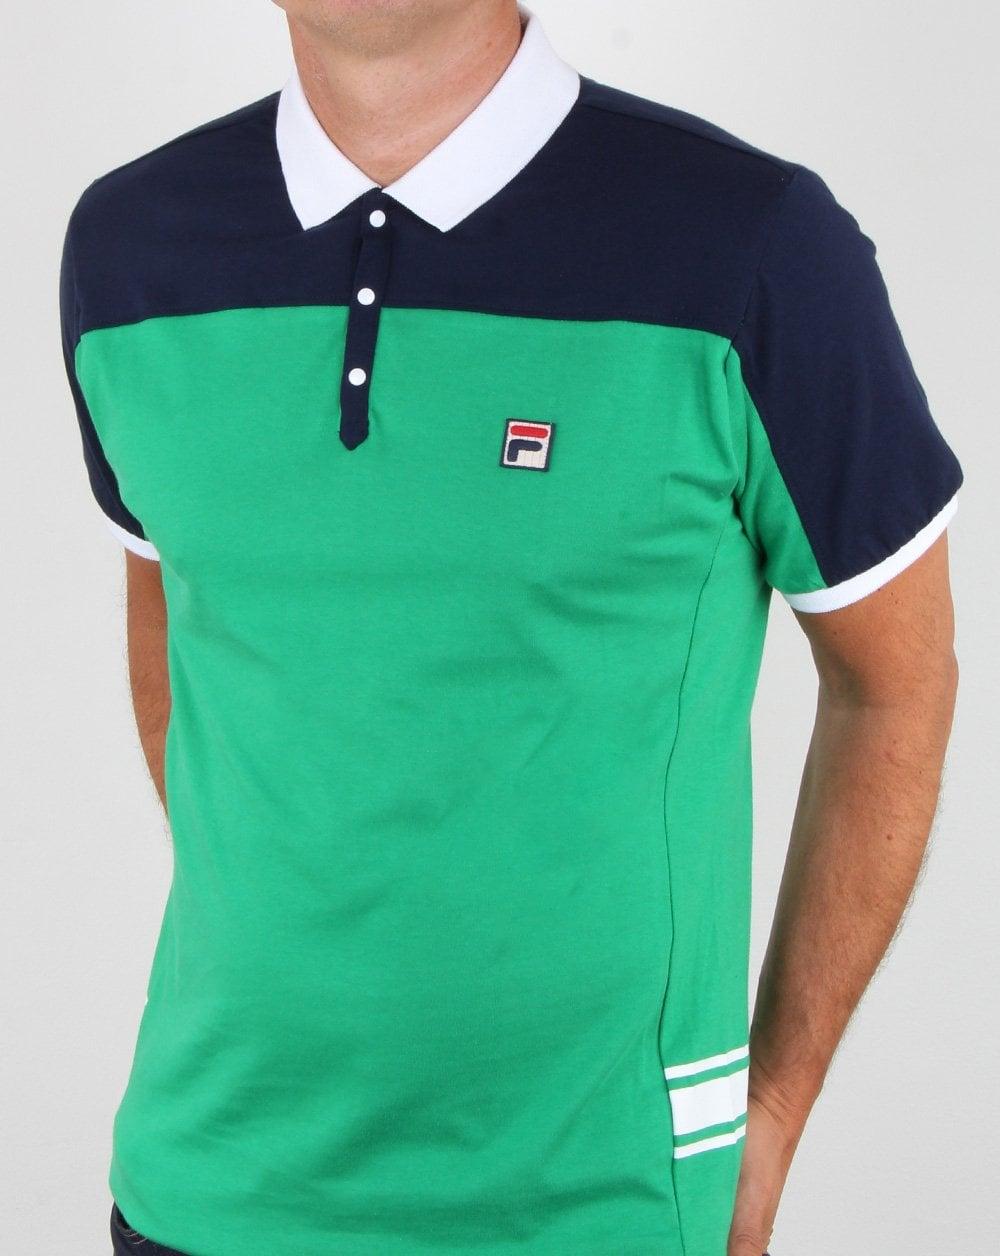 39f38fed5d4fd Fila Vintage vilas Polo Shirt, Green, Mens, Mivvi, Polo, Tennis,Borg